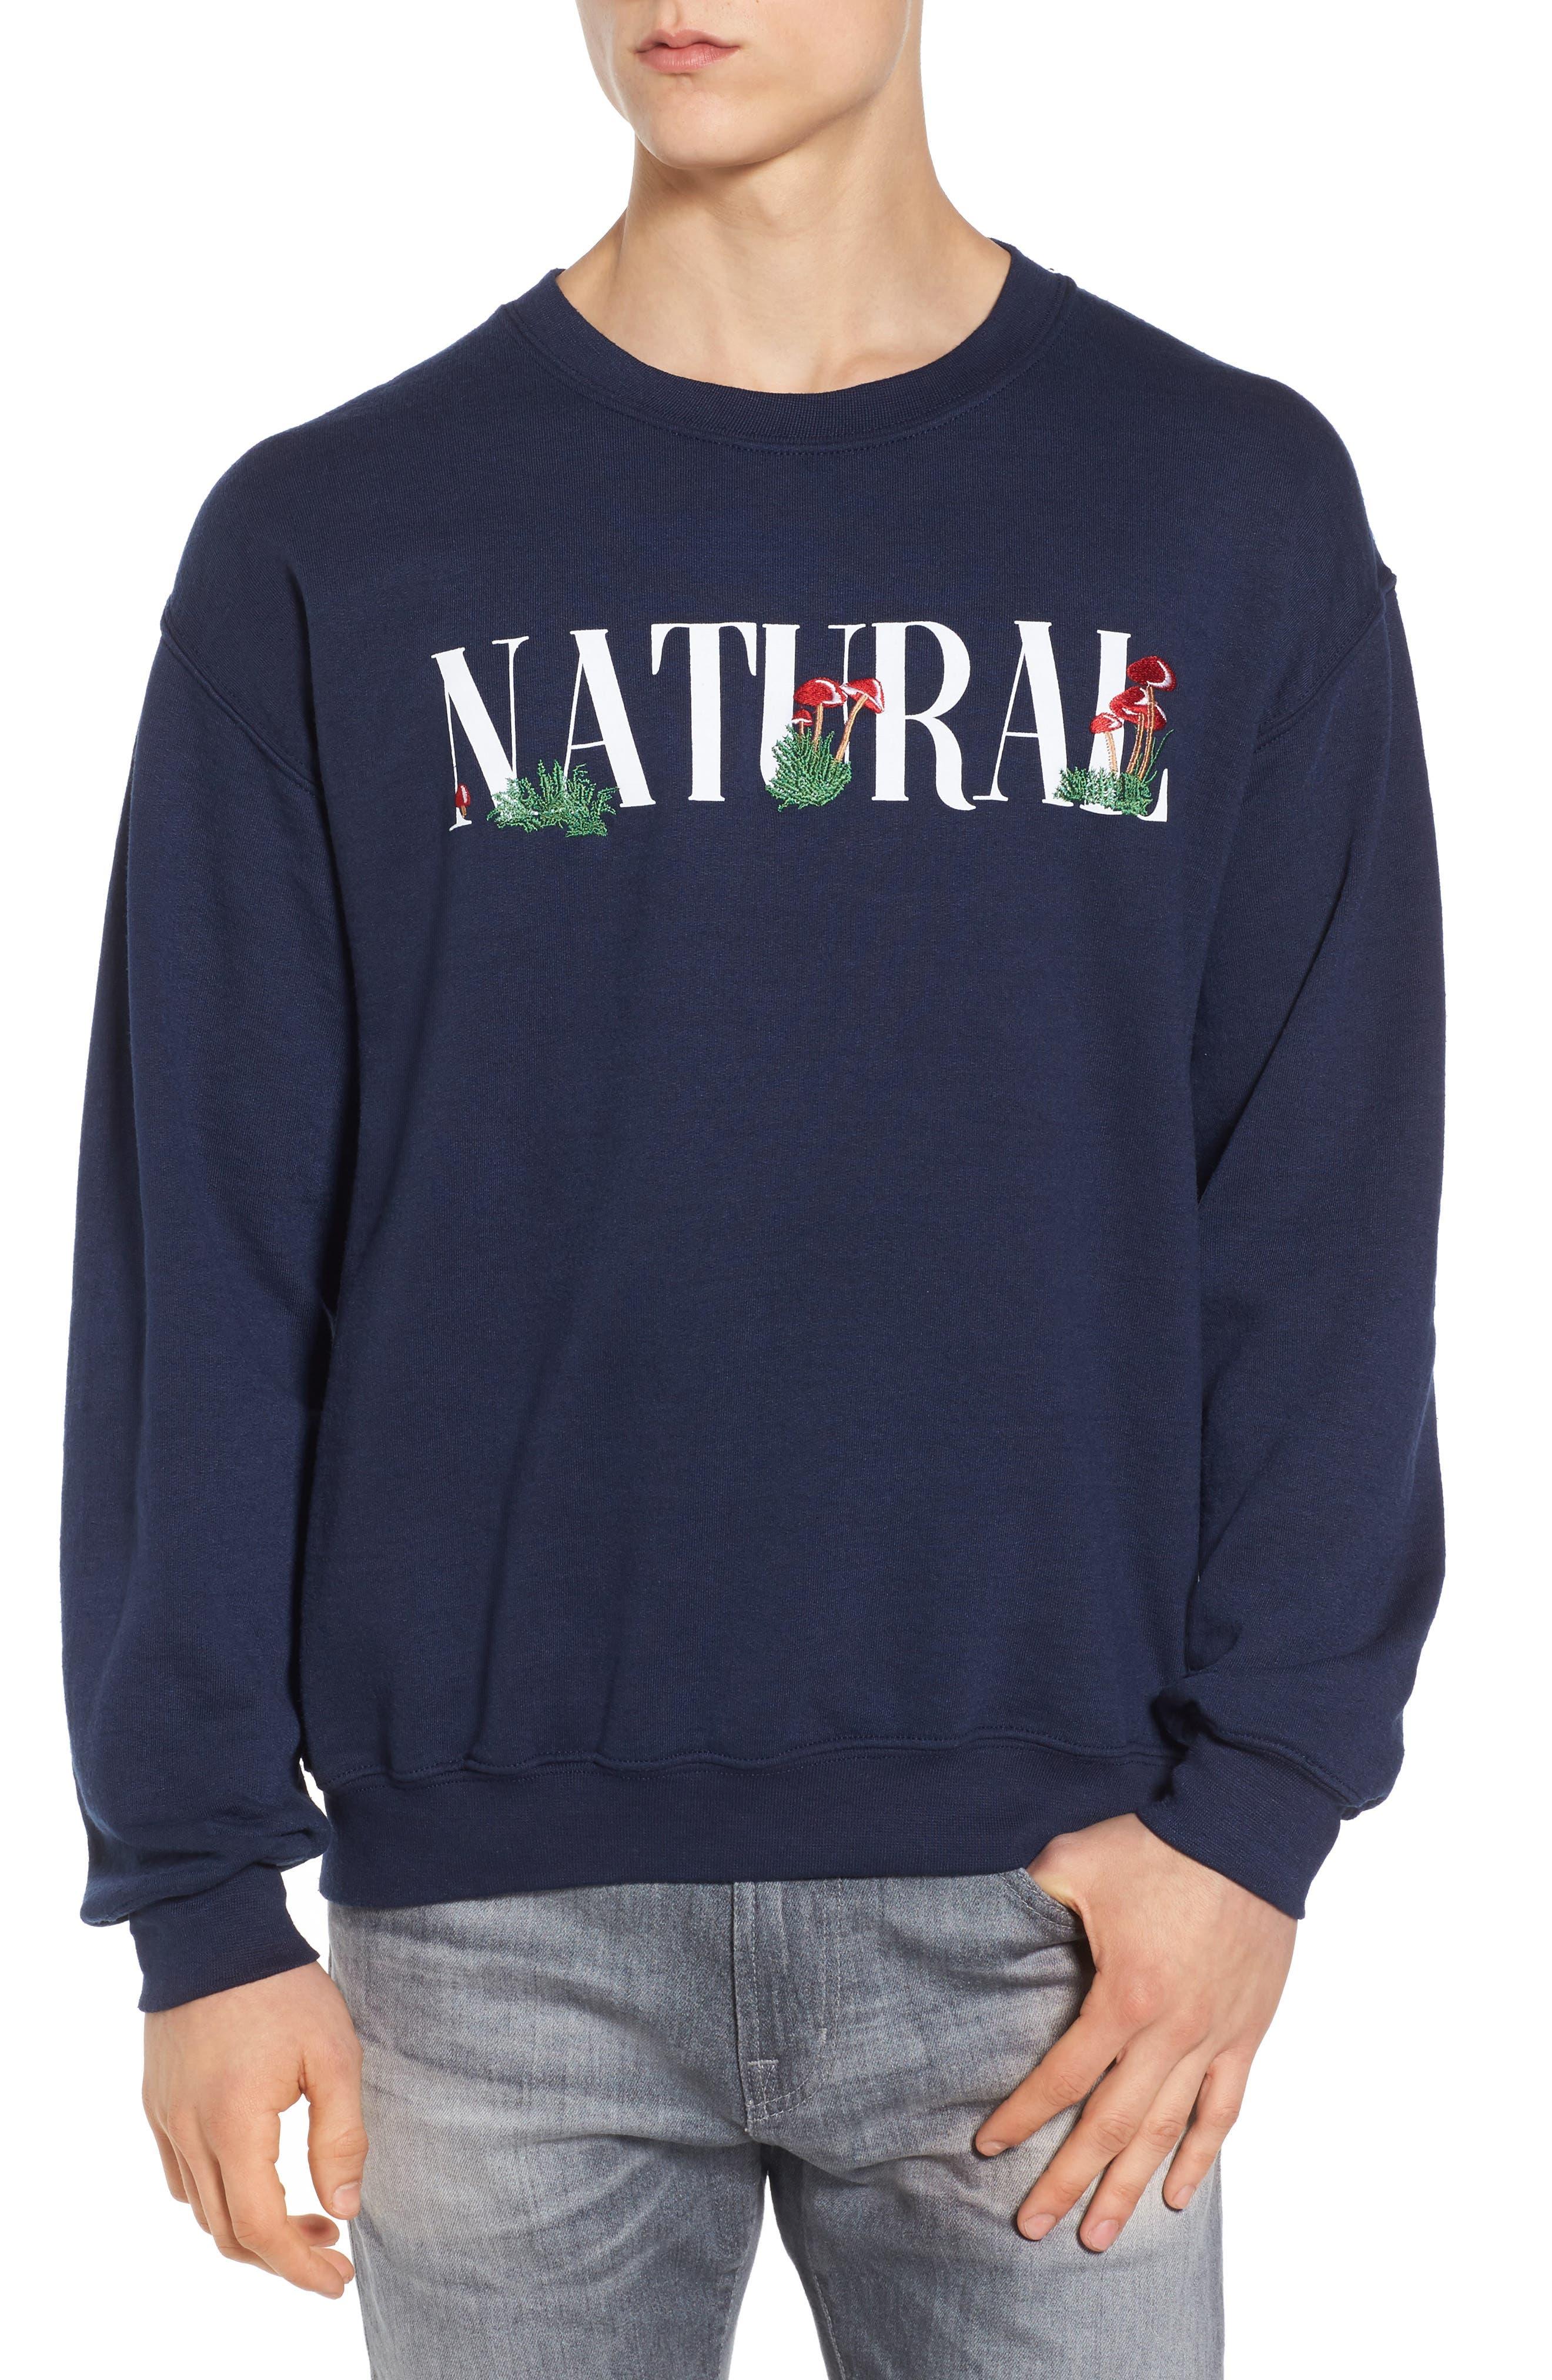 Altru Natural Mushroom Sweatshirt